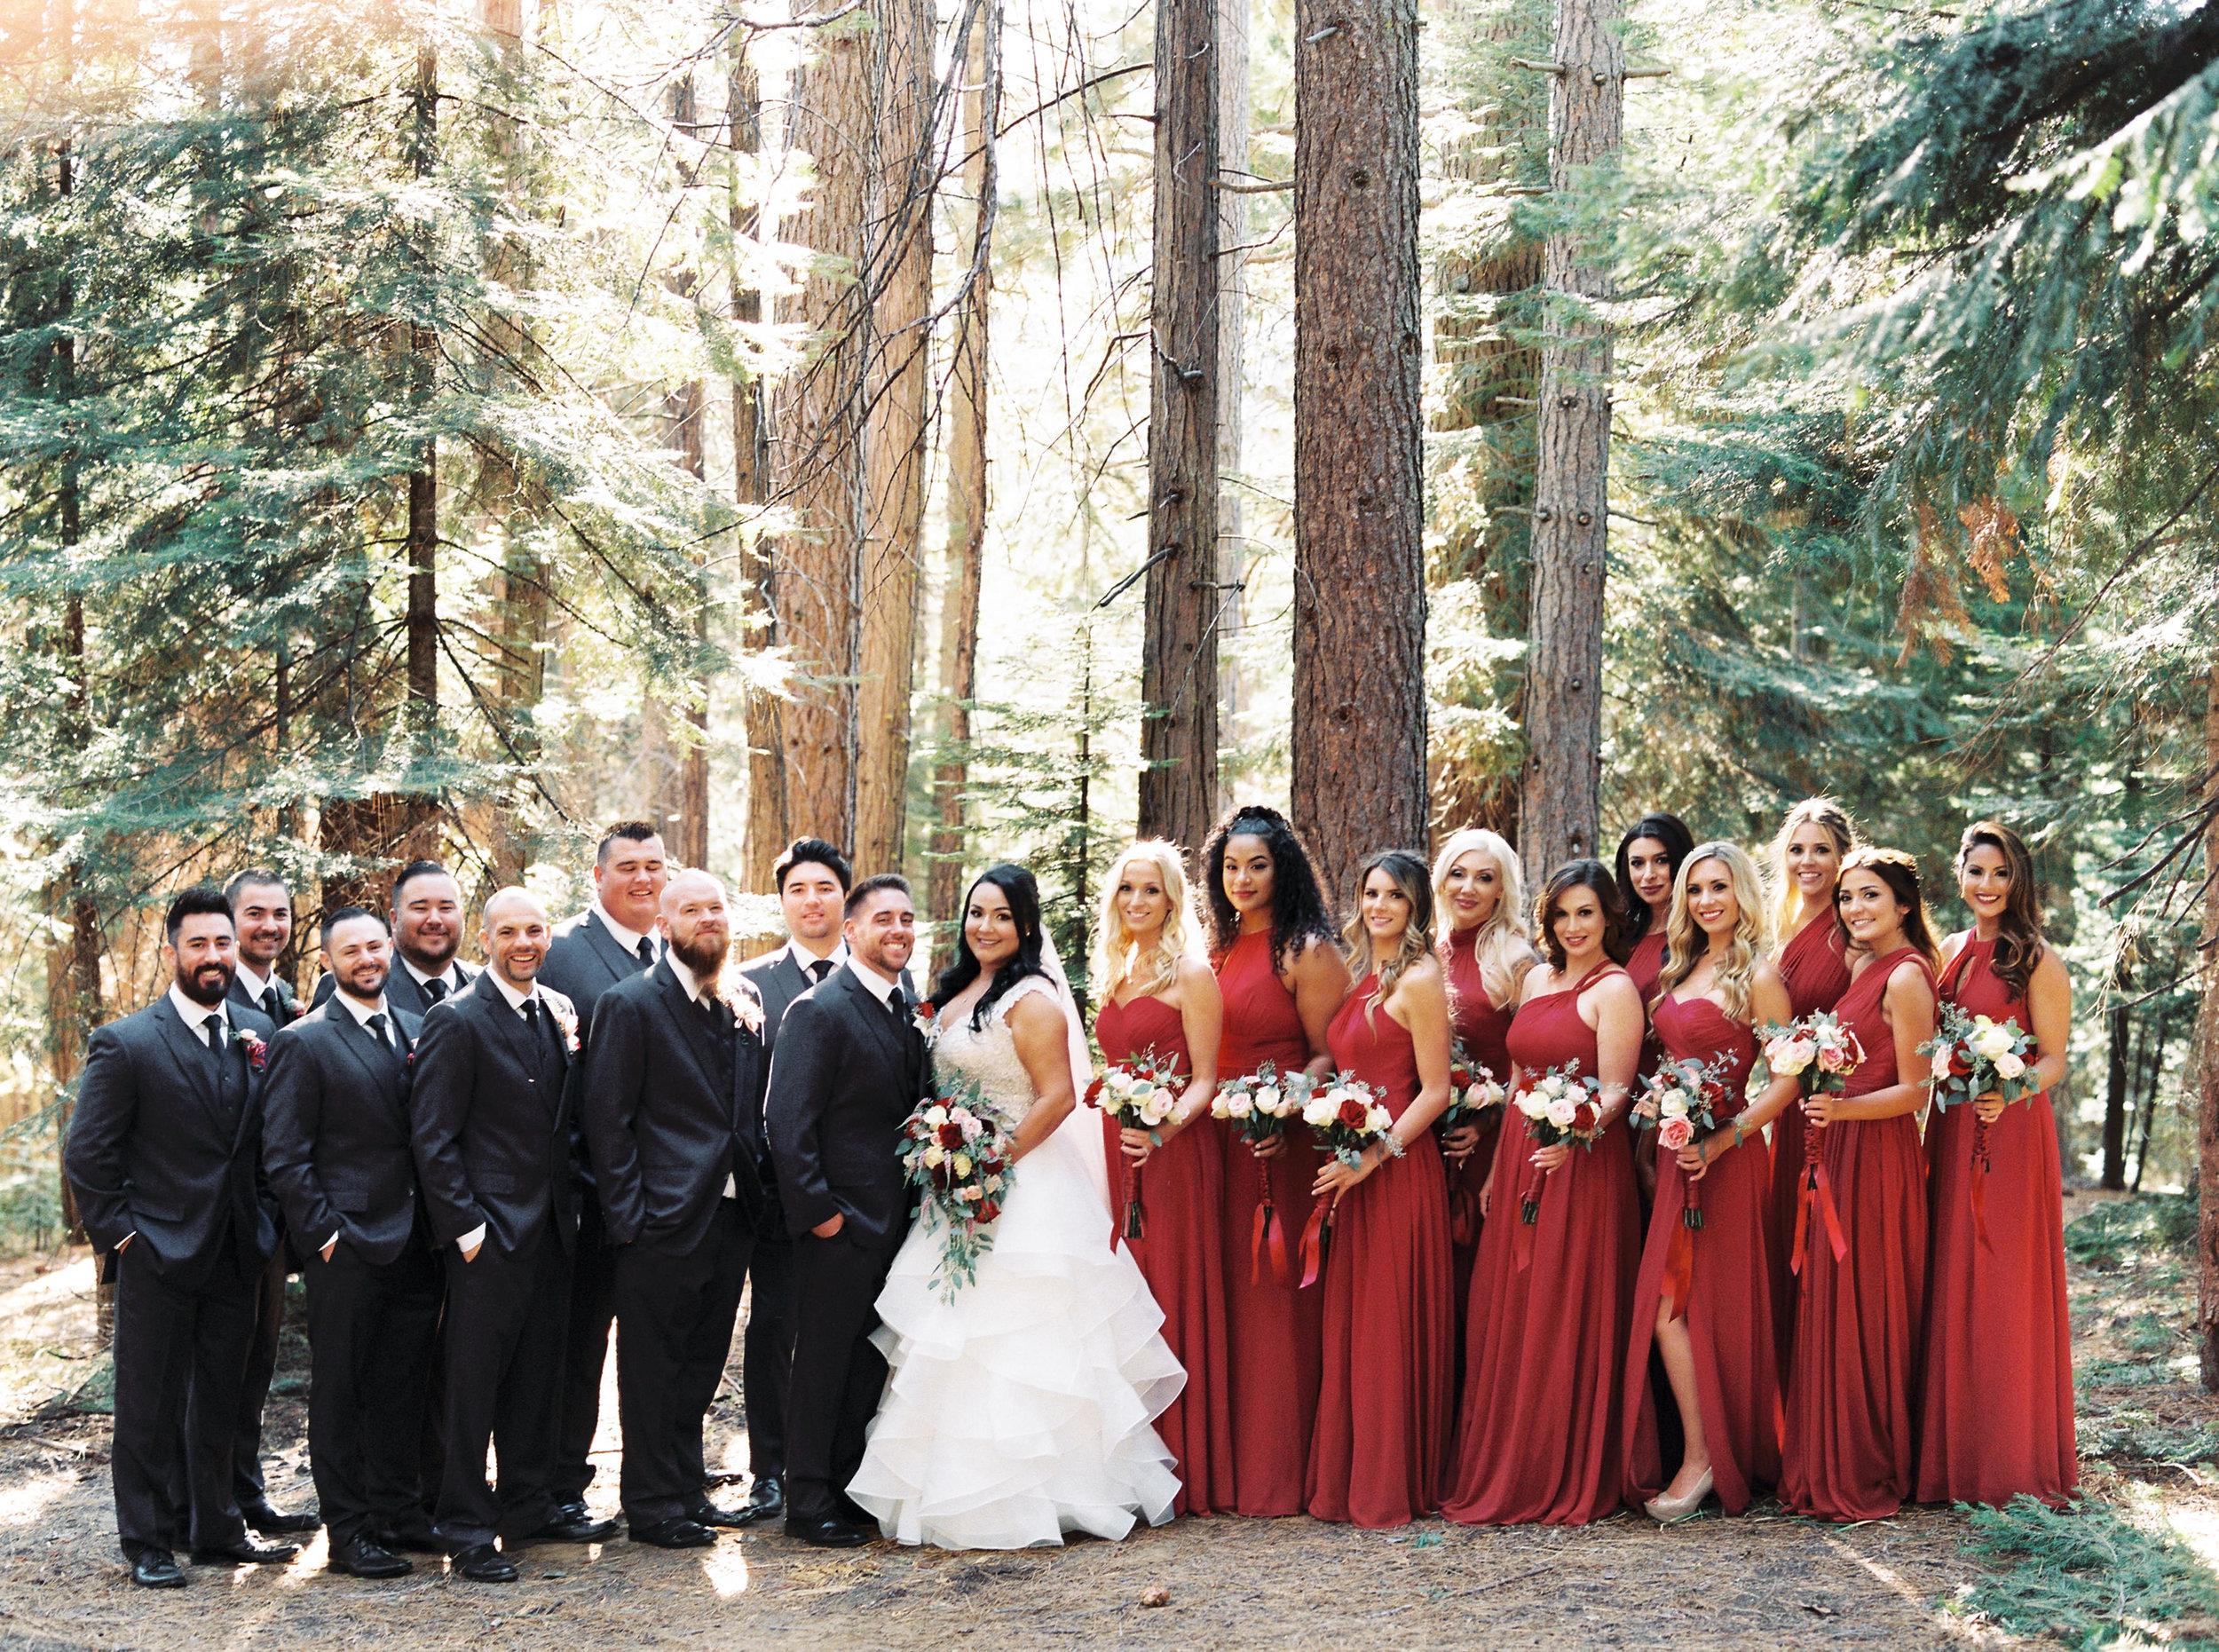 Tenaya-lodge-wedding-at-yosemite-national-park-california-94.jpg